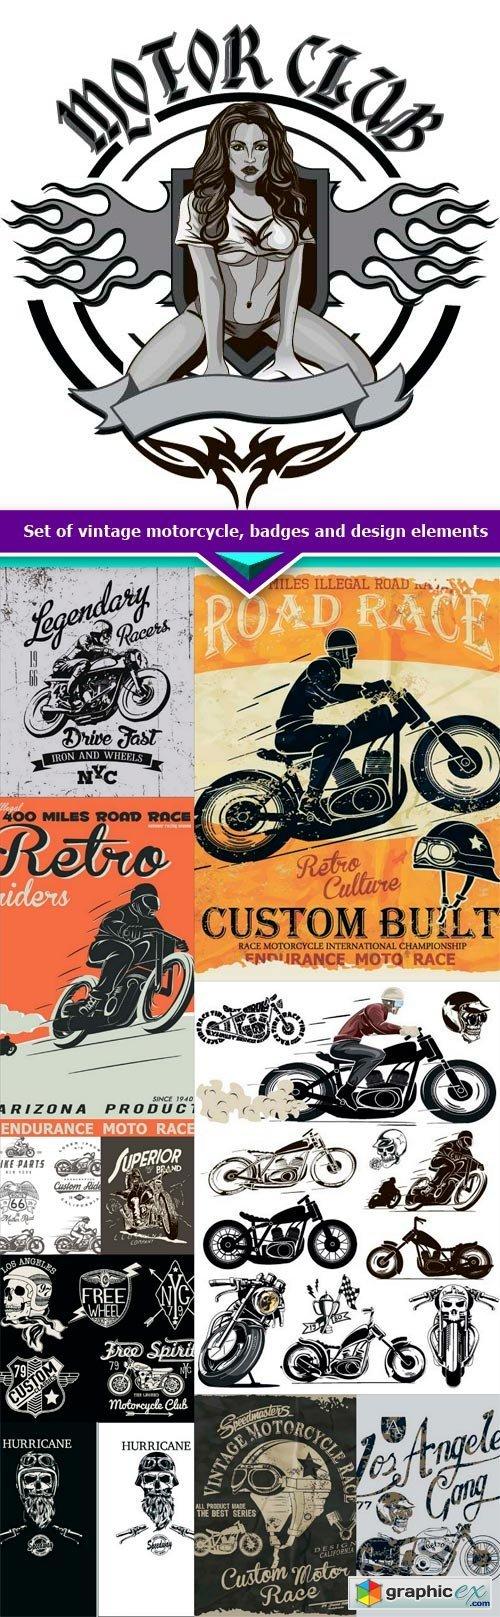 Set of vintage motorcycle, badges and design elements 11X JPEG